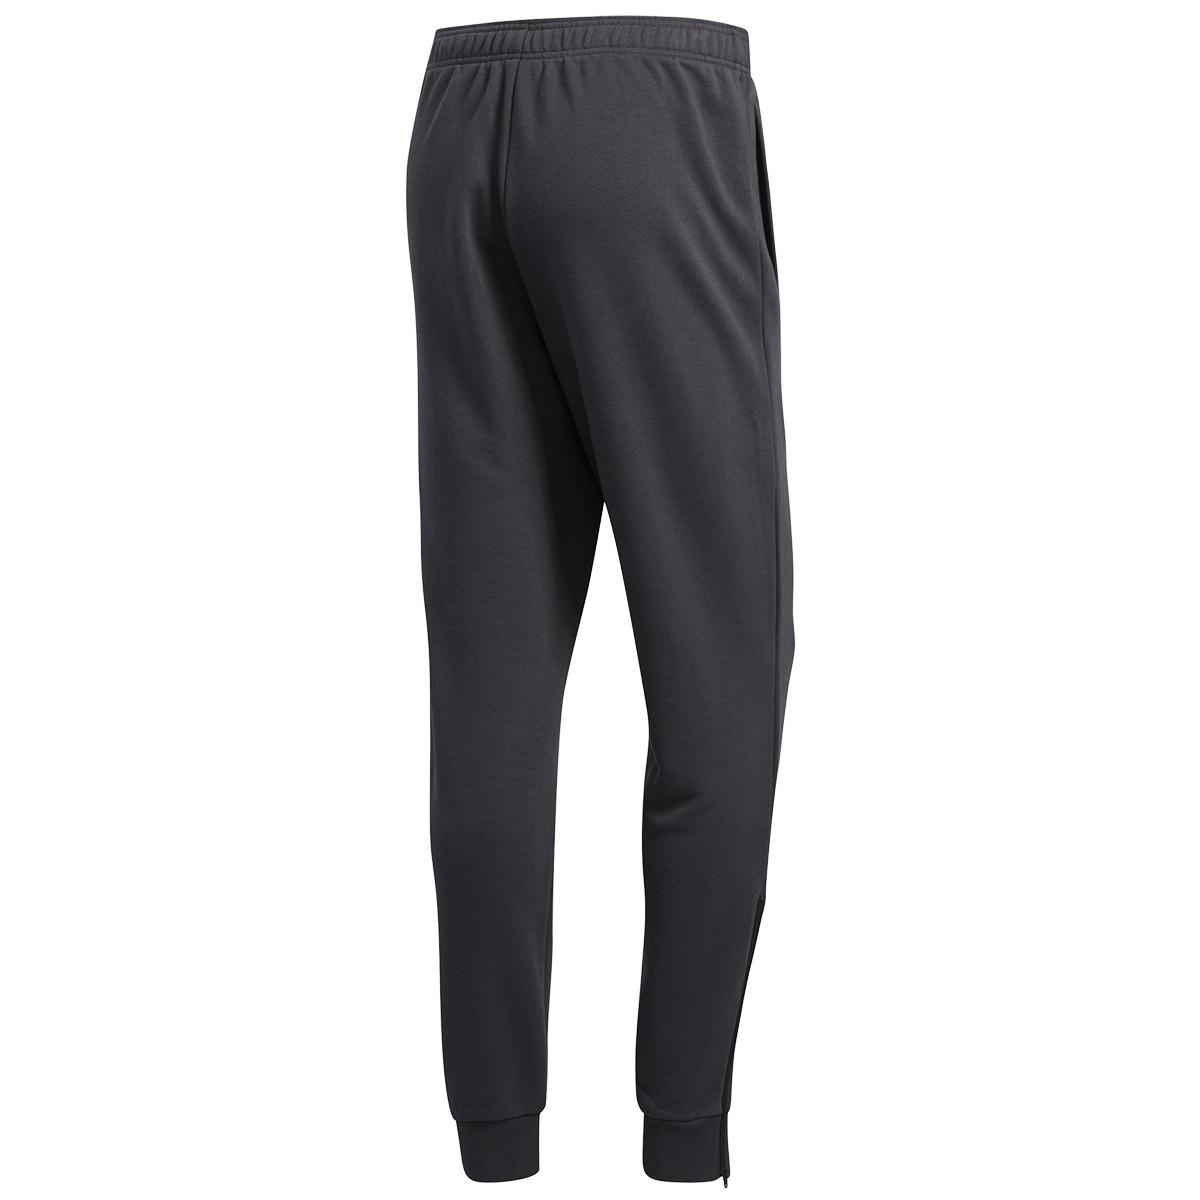 pantalon adidas pression homme